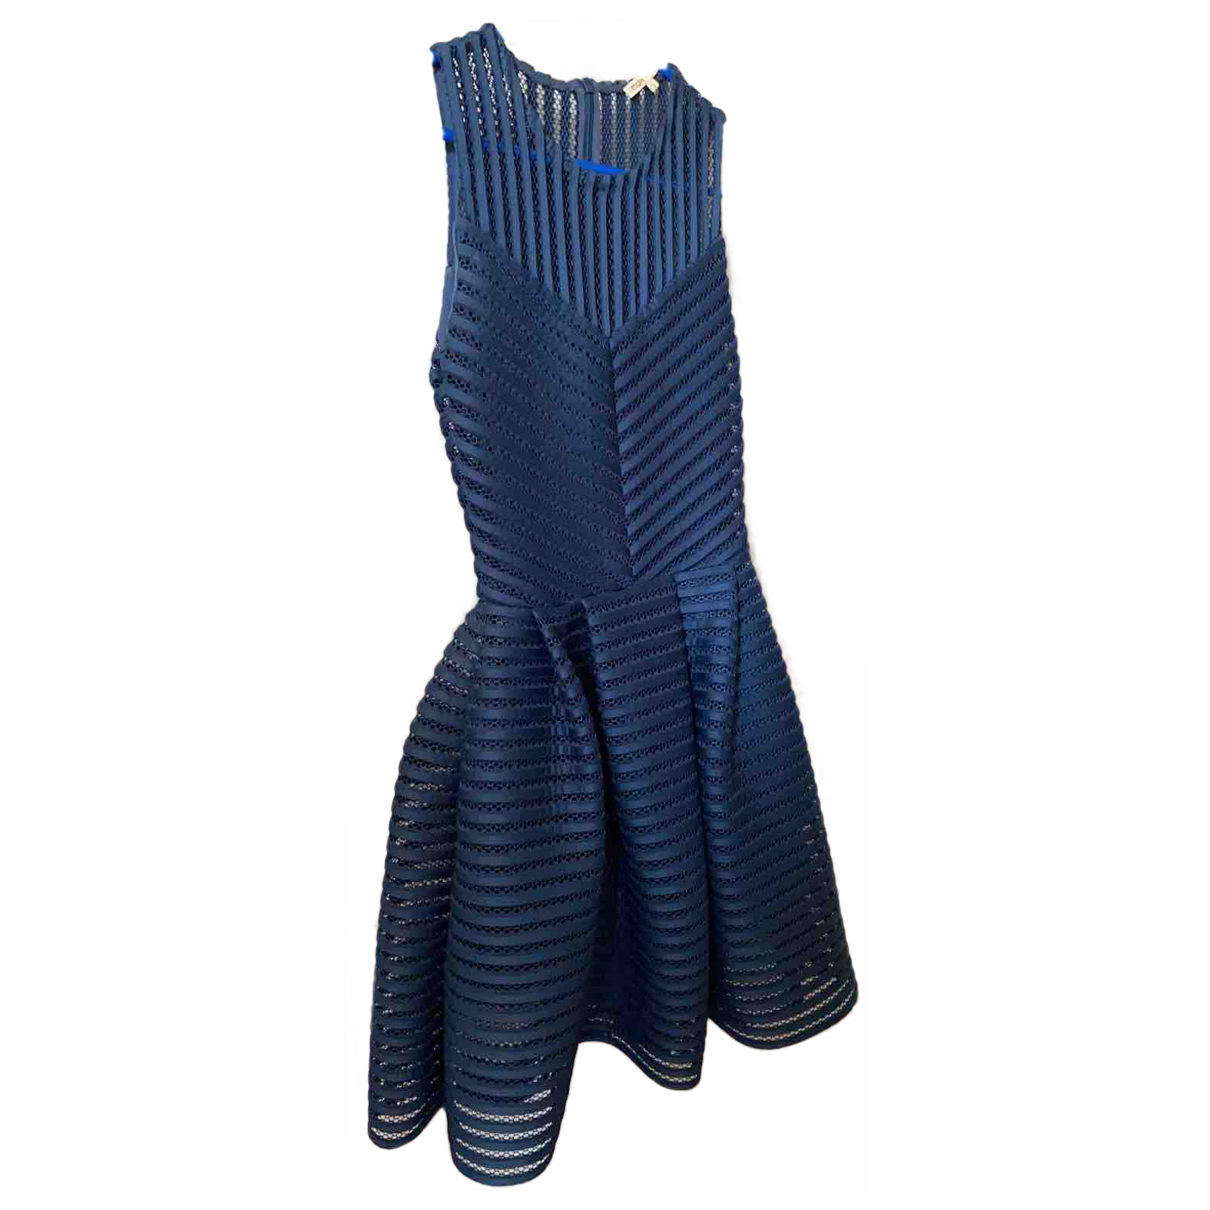 Maje Fall Winter 2019 Blue Lace dress for Women 36 FR